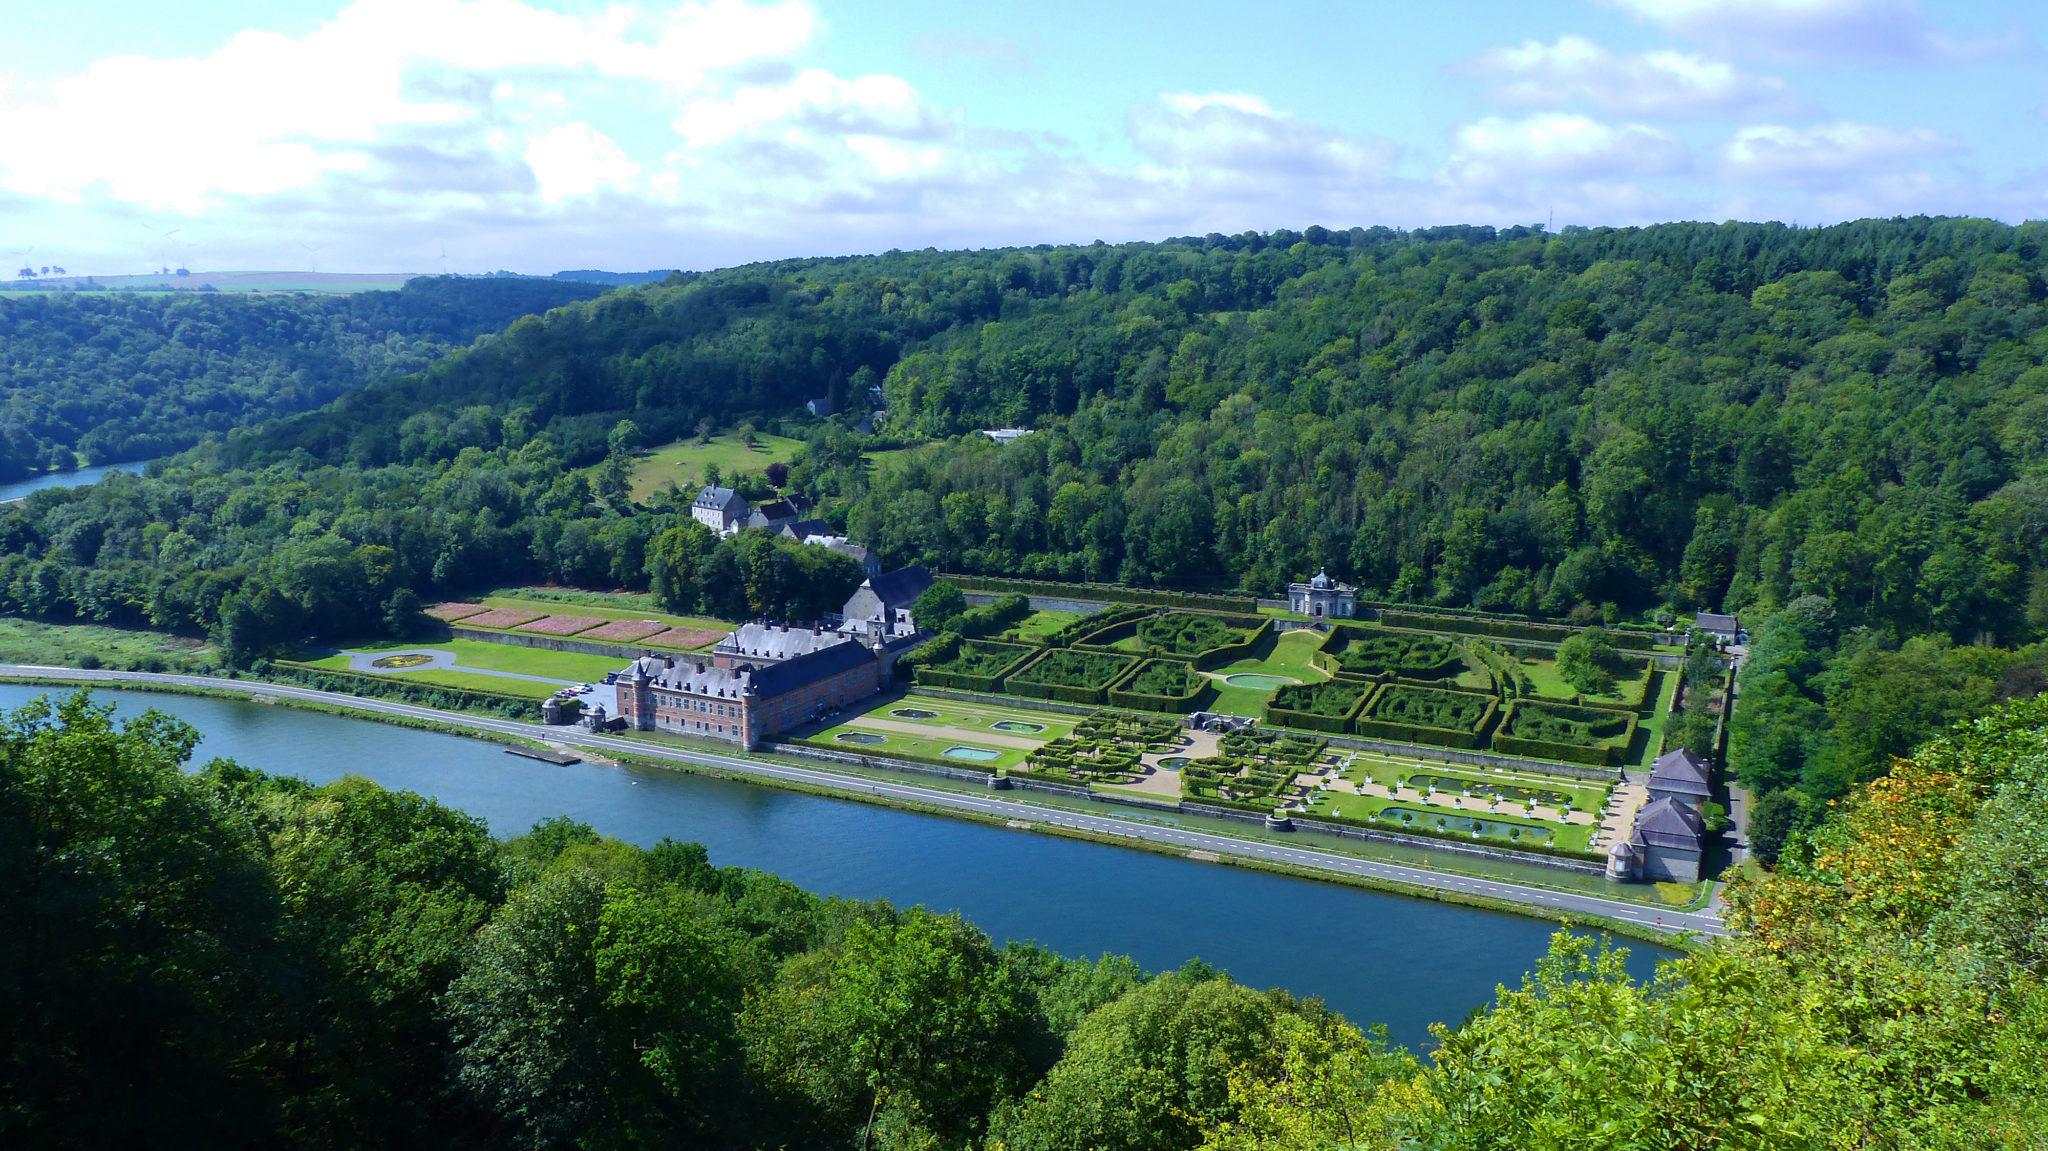 Widok na zamek Freÿr z  drugiego brzegu Mozy; foto: Axel Bonaert de Laupesbin